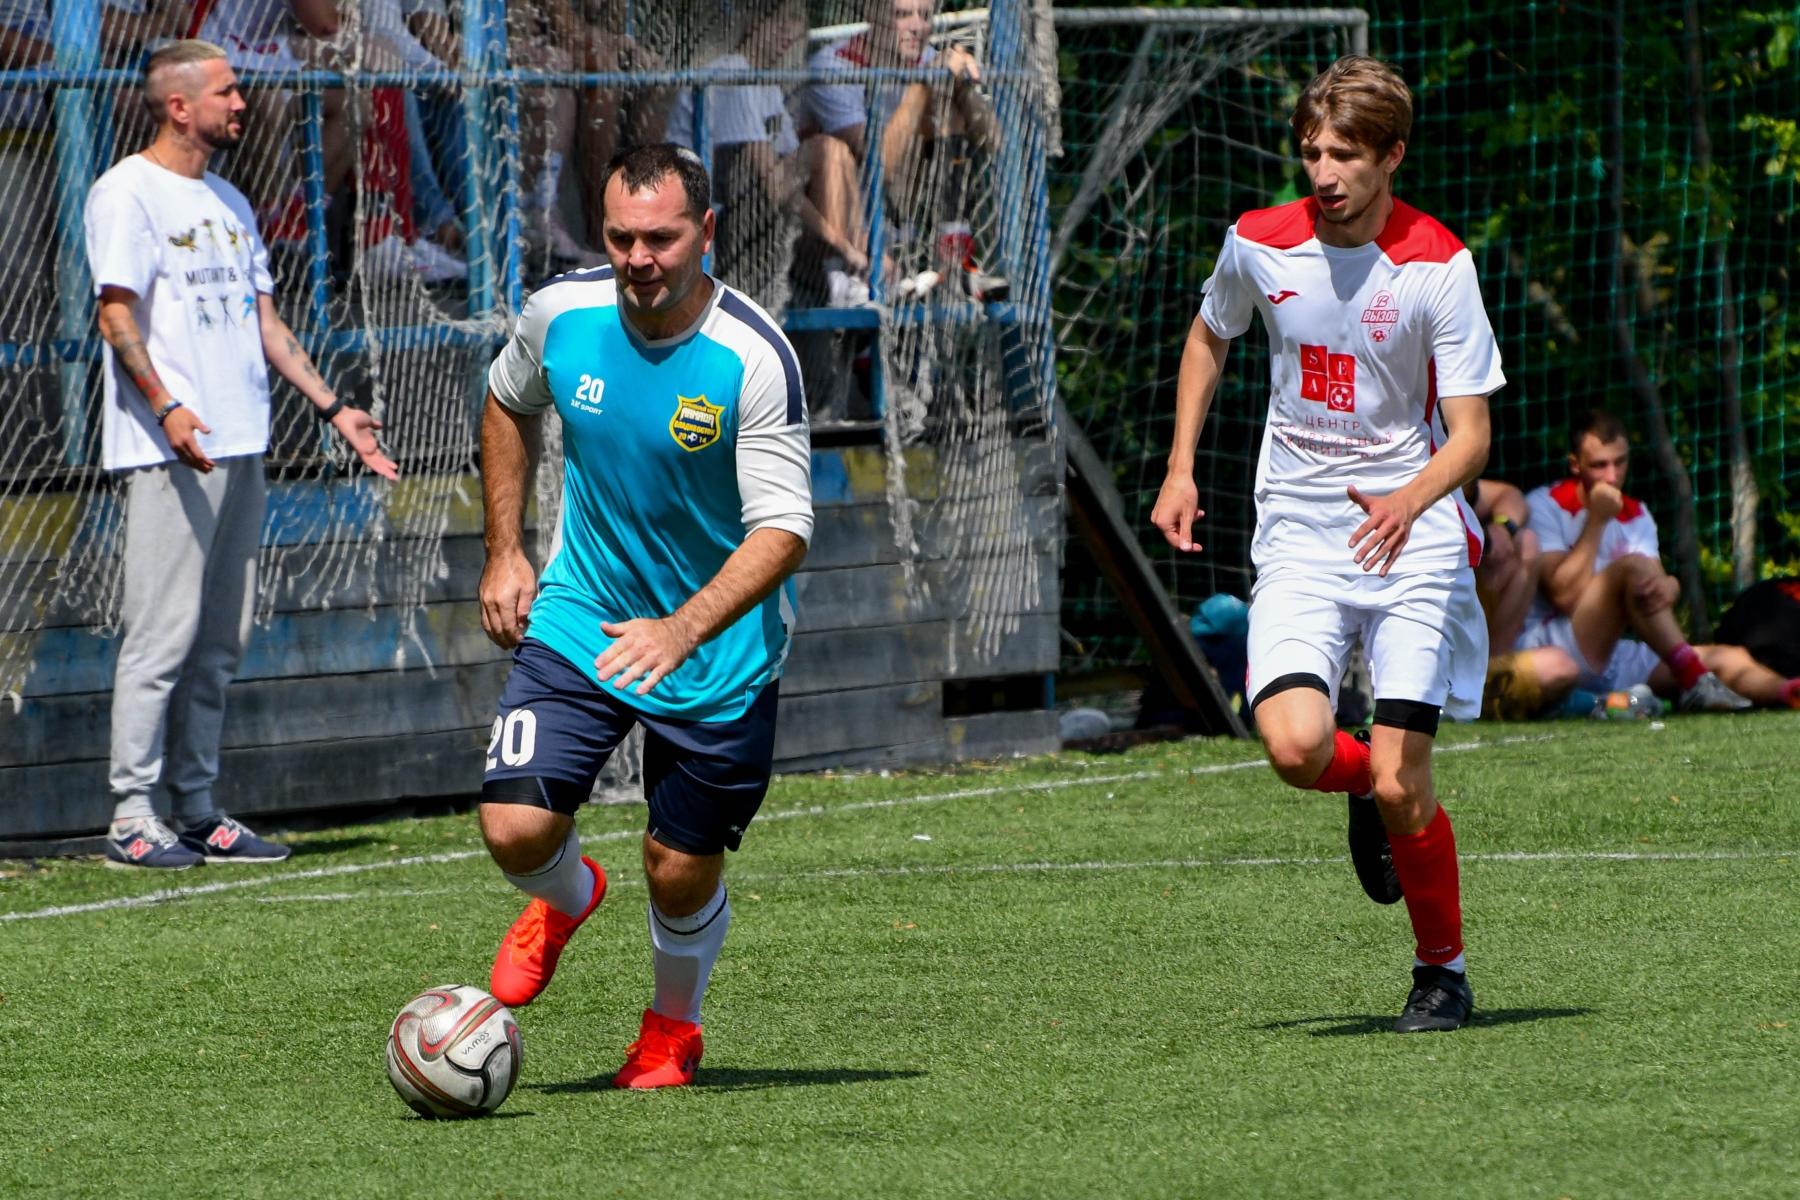 футбол Владивостока, новости футбола, футбол Приморье, футбол Приморский край